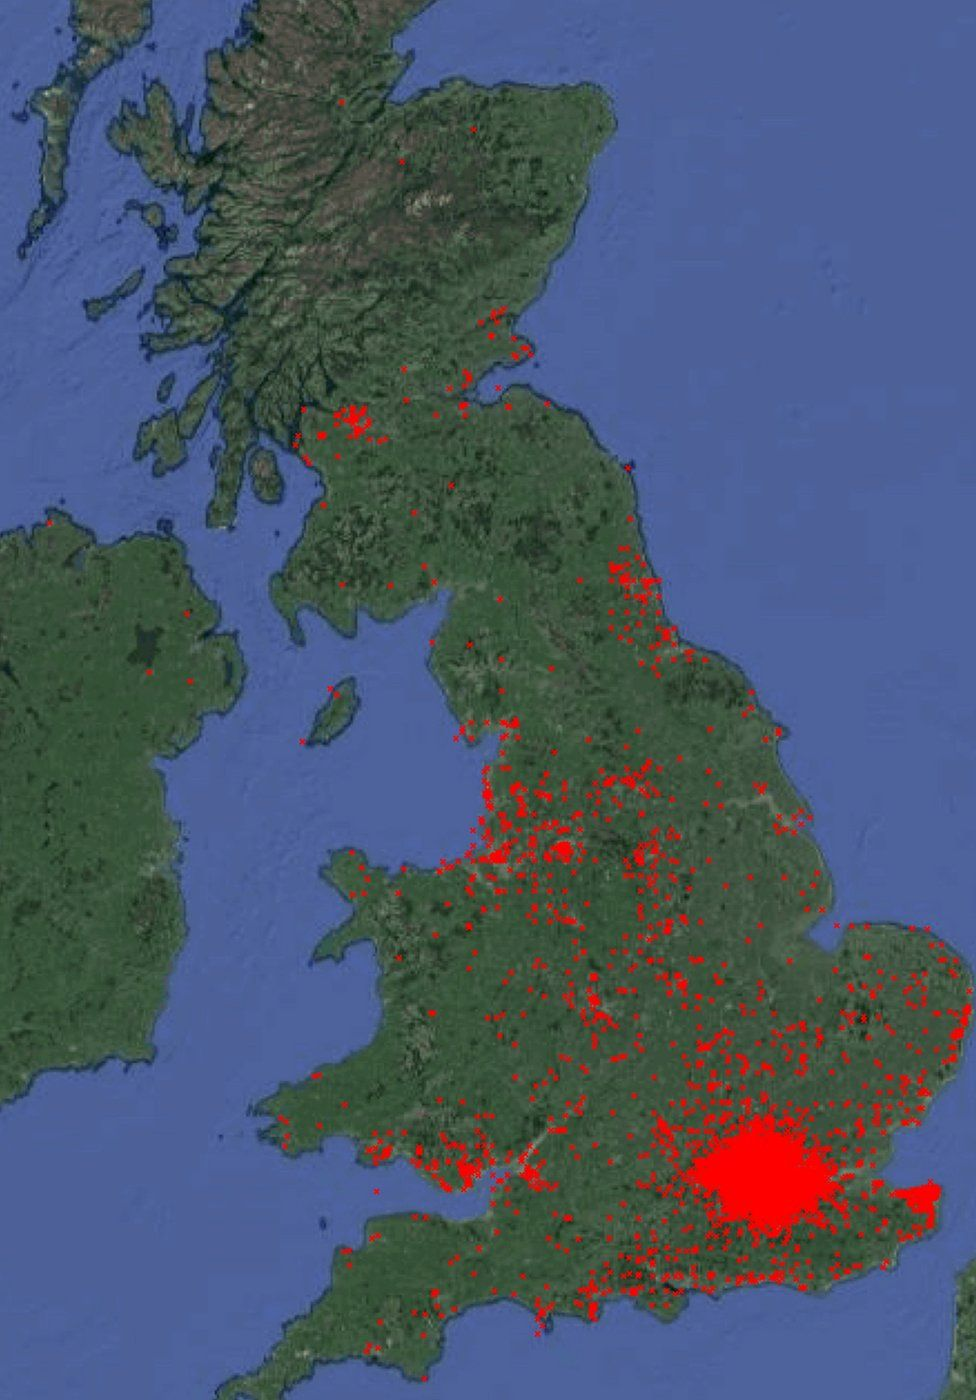 map of parakeet spread